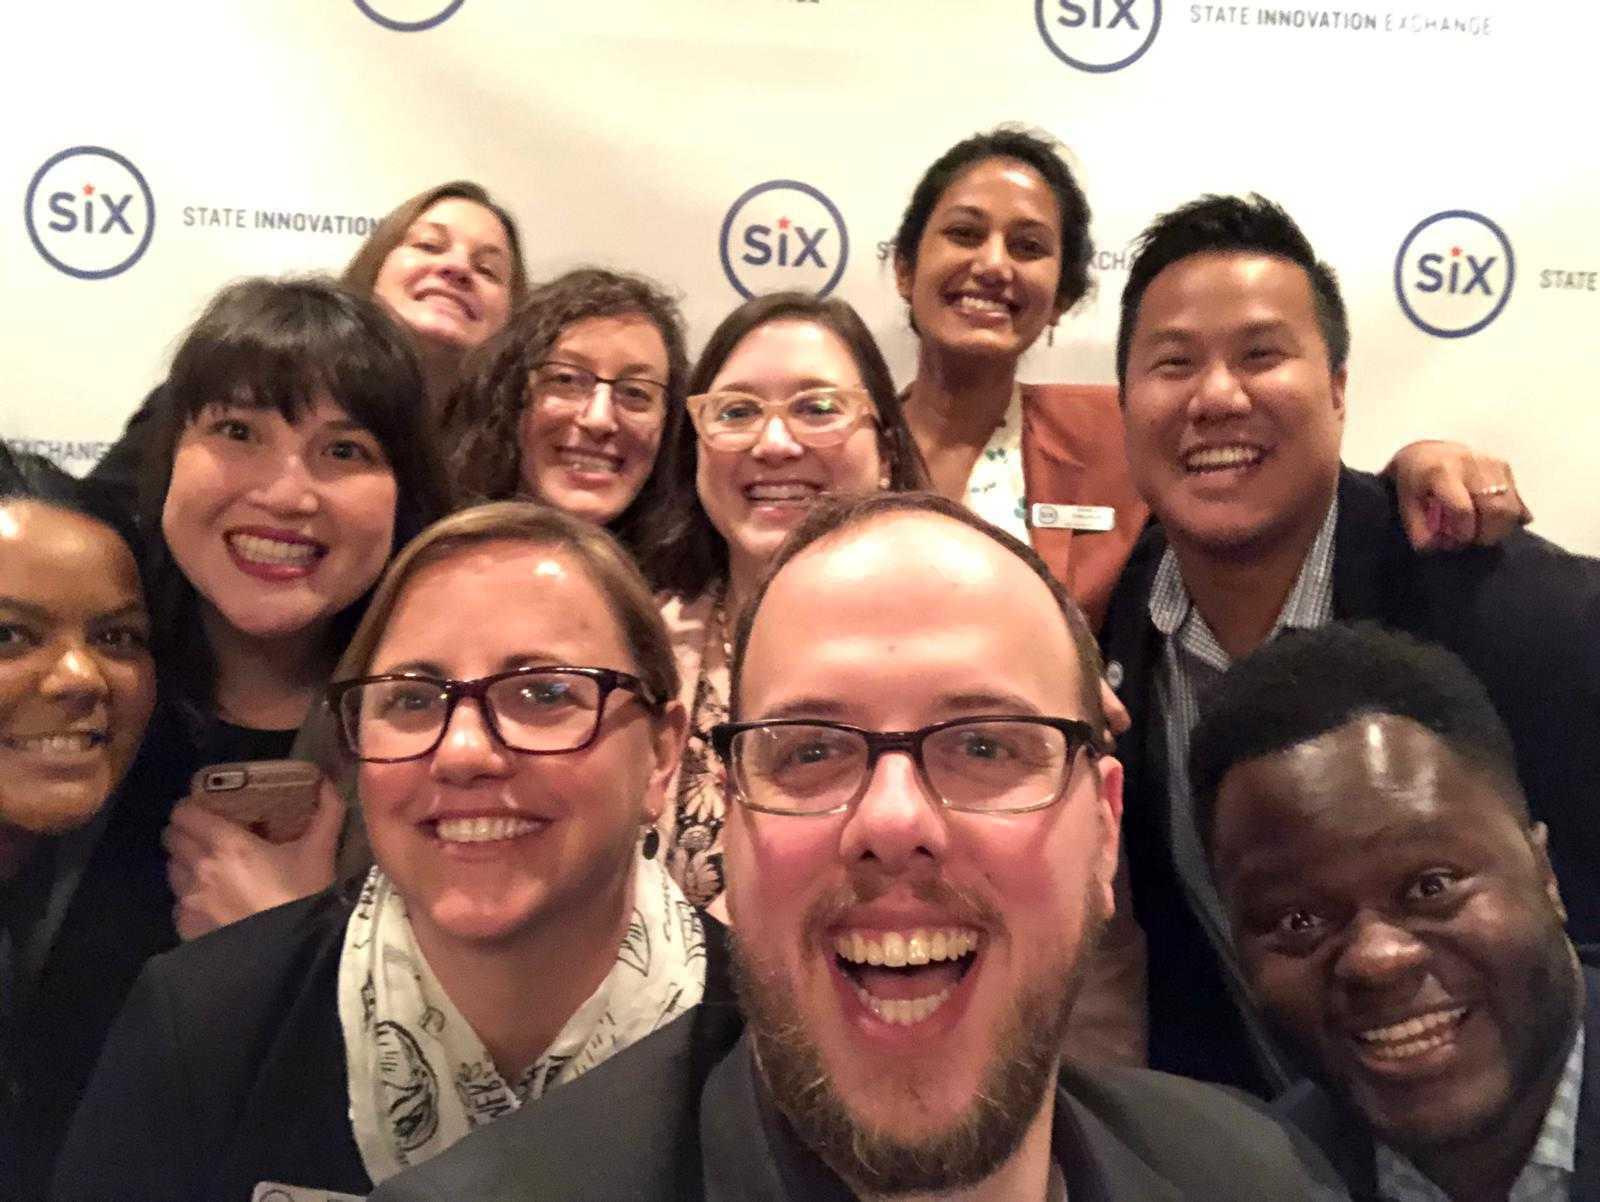 Six staff selfie